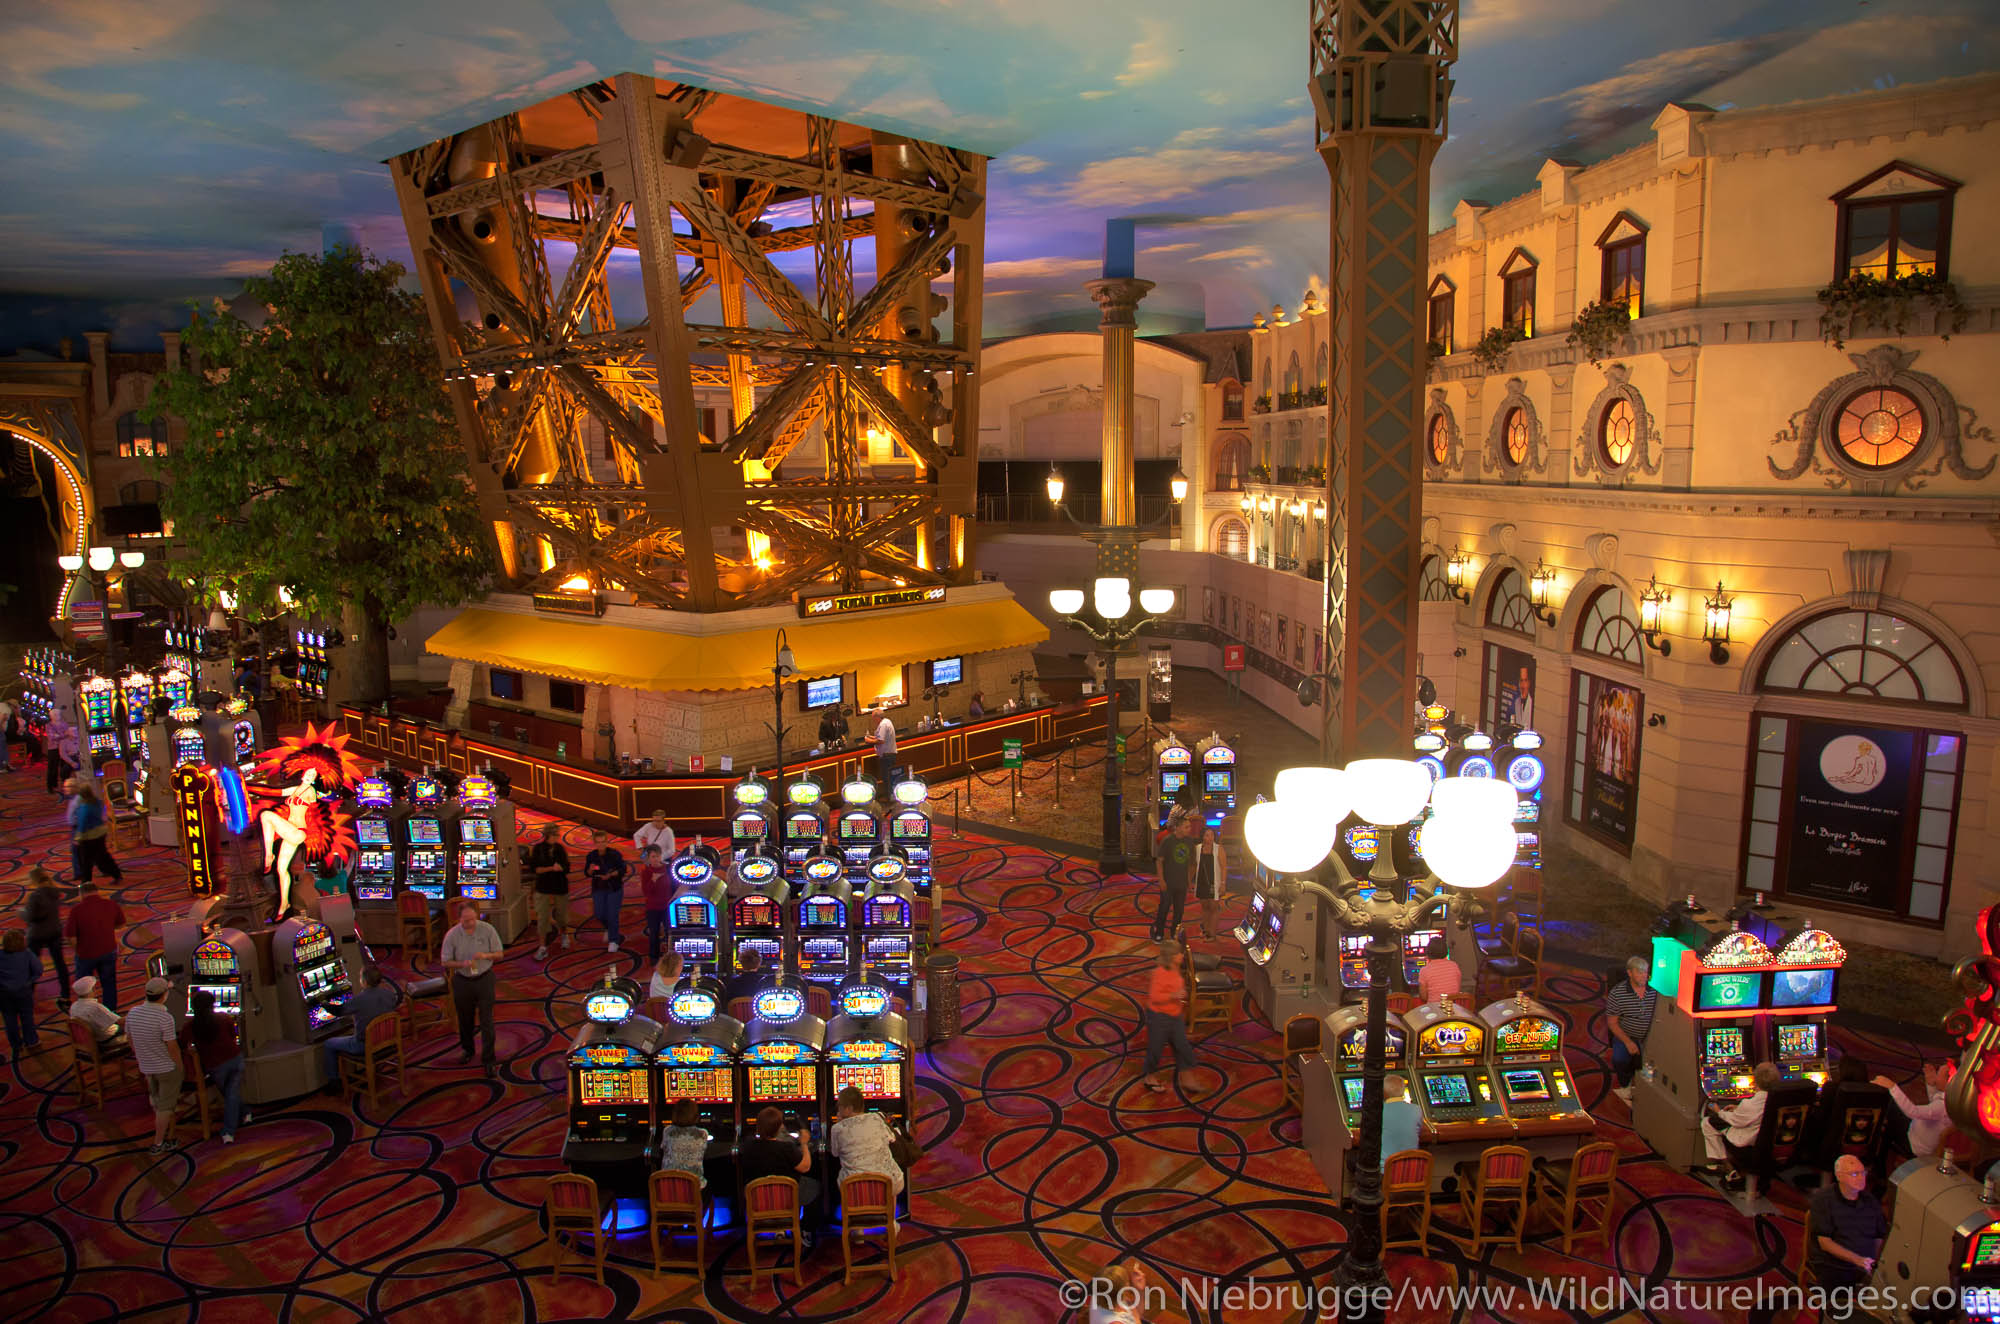 Inside the Casino at Paris Las Vegas Hotel and Casino, Las Vegas, NV